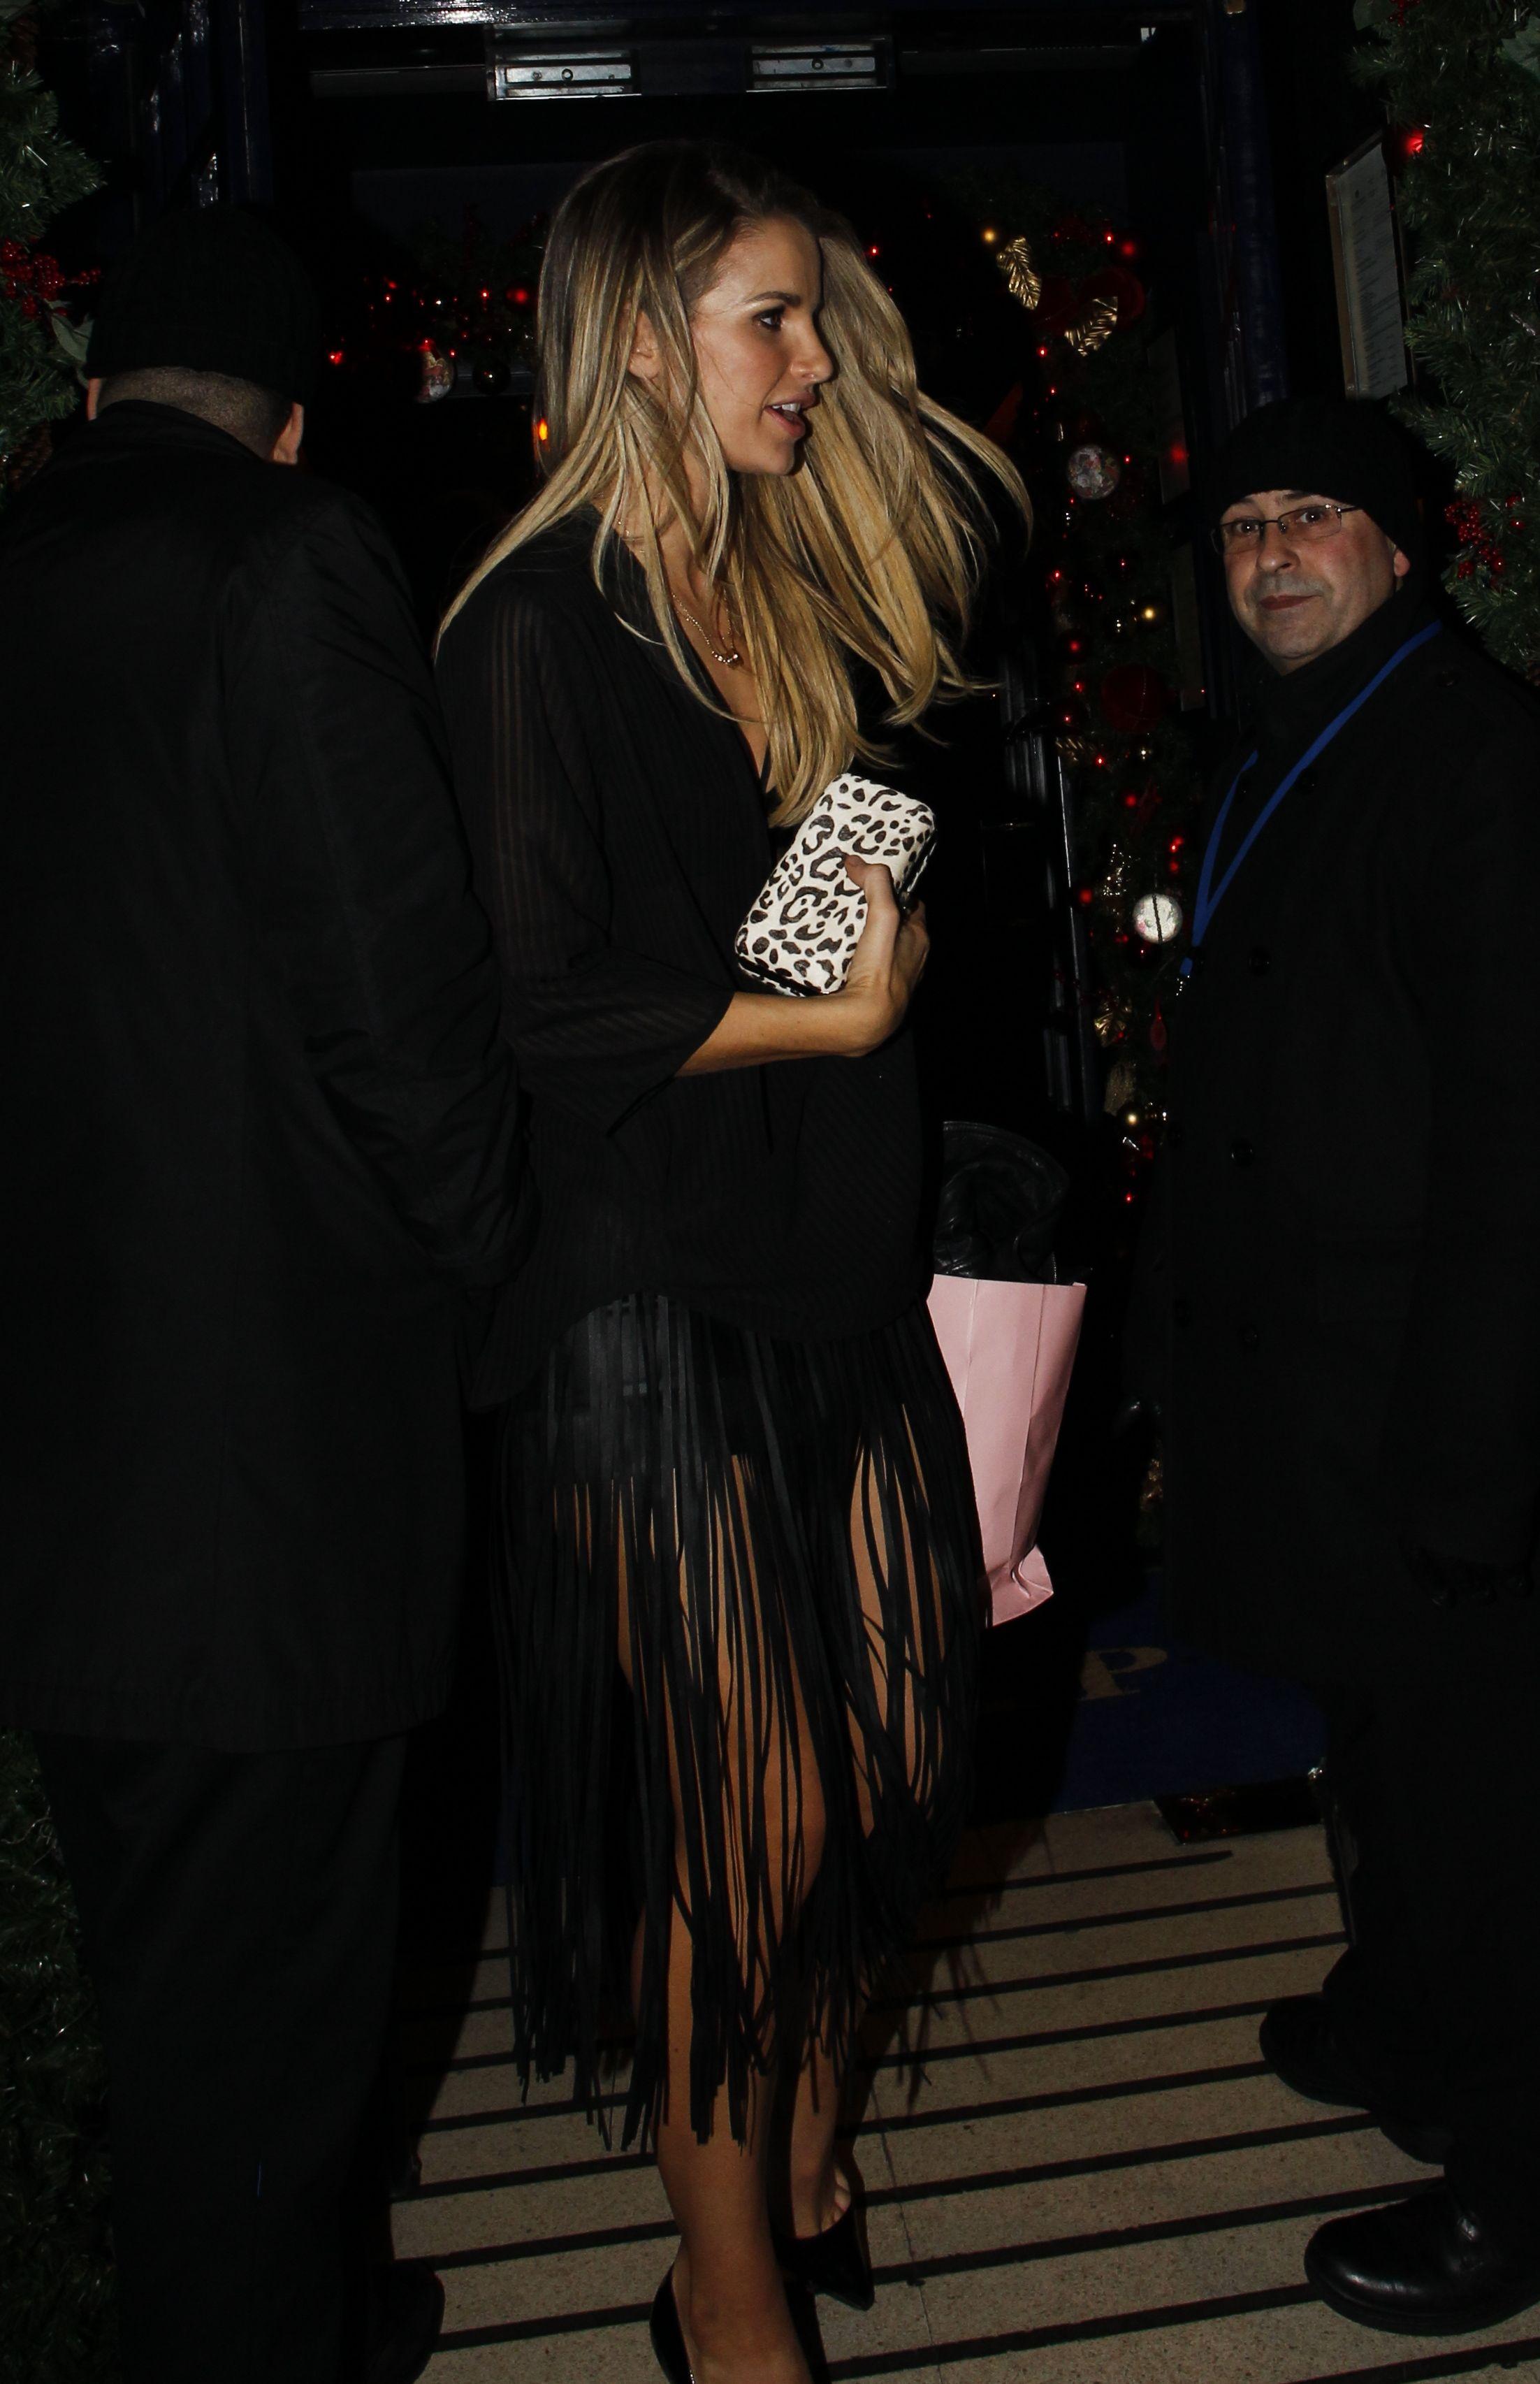 Vogue Williams 2015 : Vogue Williams: Sunday Times STYLE Magazines -14